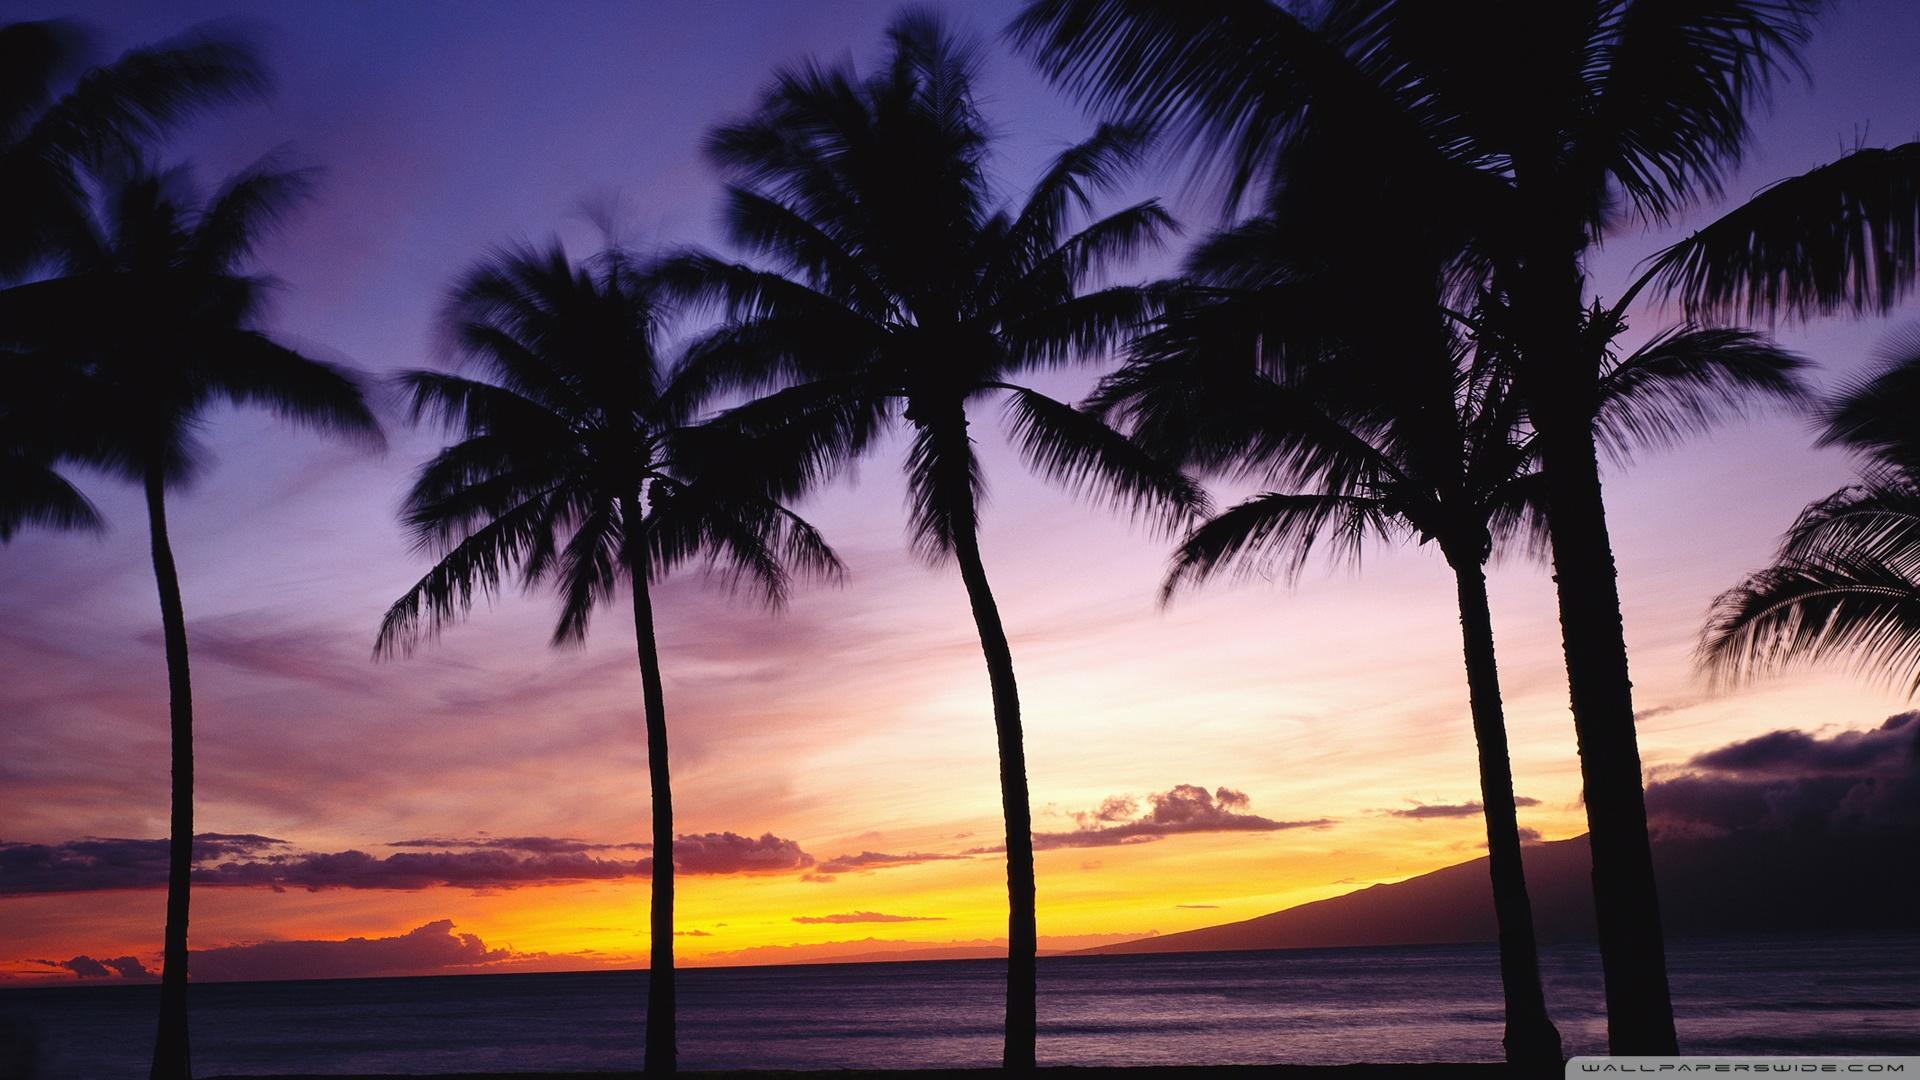 Download Palm Trees Sunset Wallpaper 1920x1080 Wallpoper 1920x1080